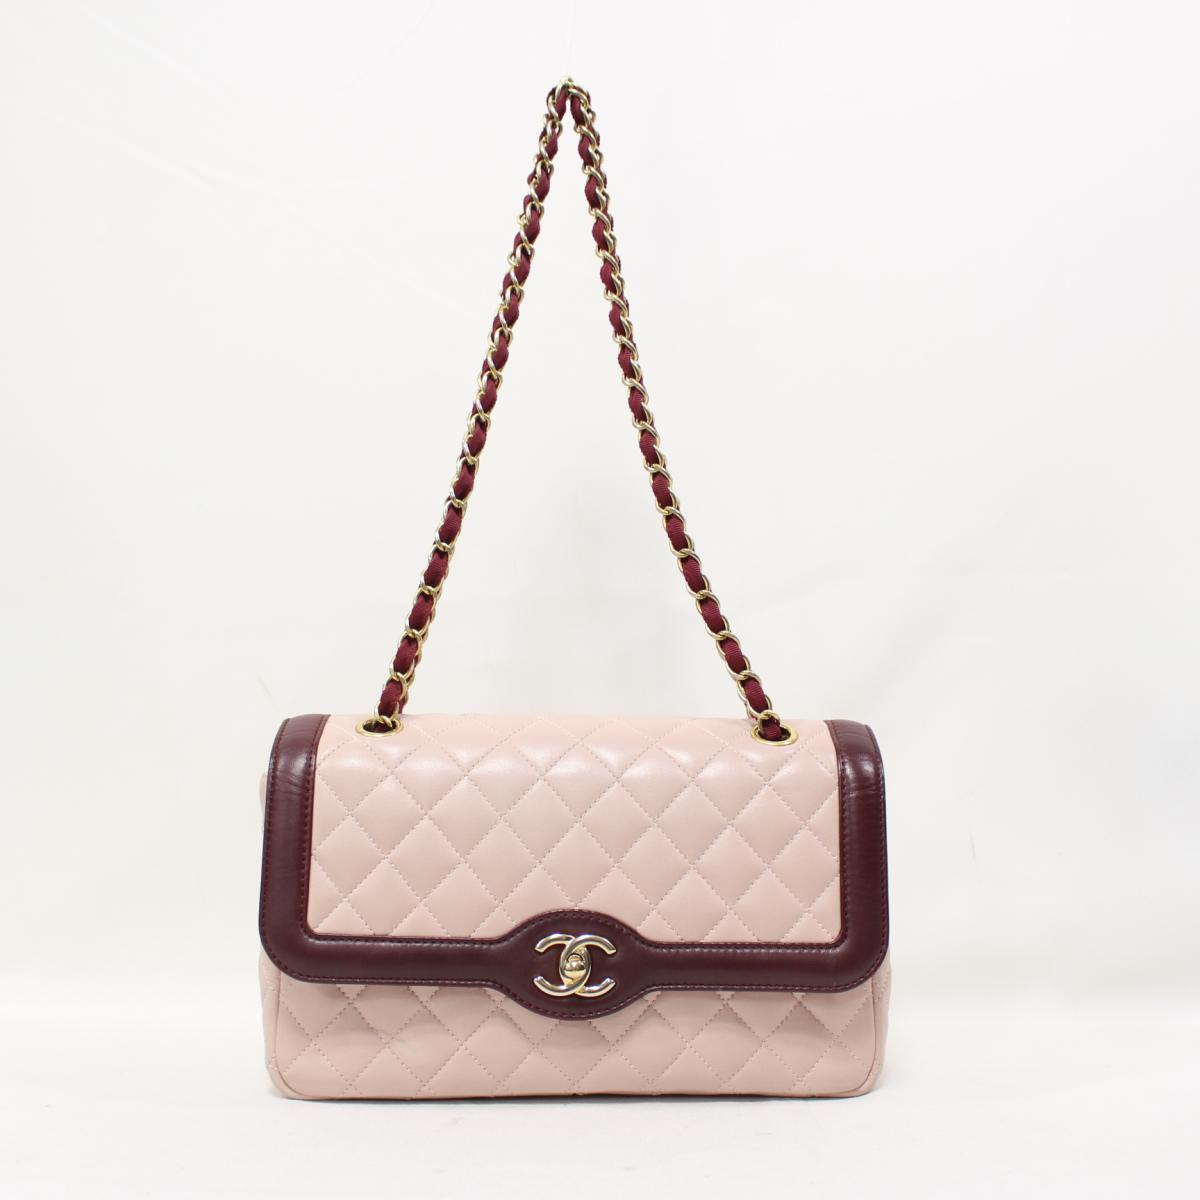 bf70c5af96bb84 BRANDOFF: Auth CHANEL Matelasse CC Chain Shoulder Bag Cowhide calf leather  Pink/Bordeaux Used | BRANDOFF Ginza/TOKYO/Japan | Rakuten Global Market